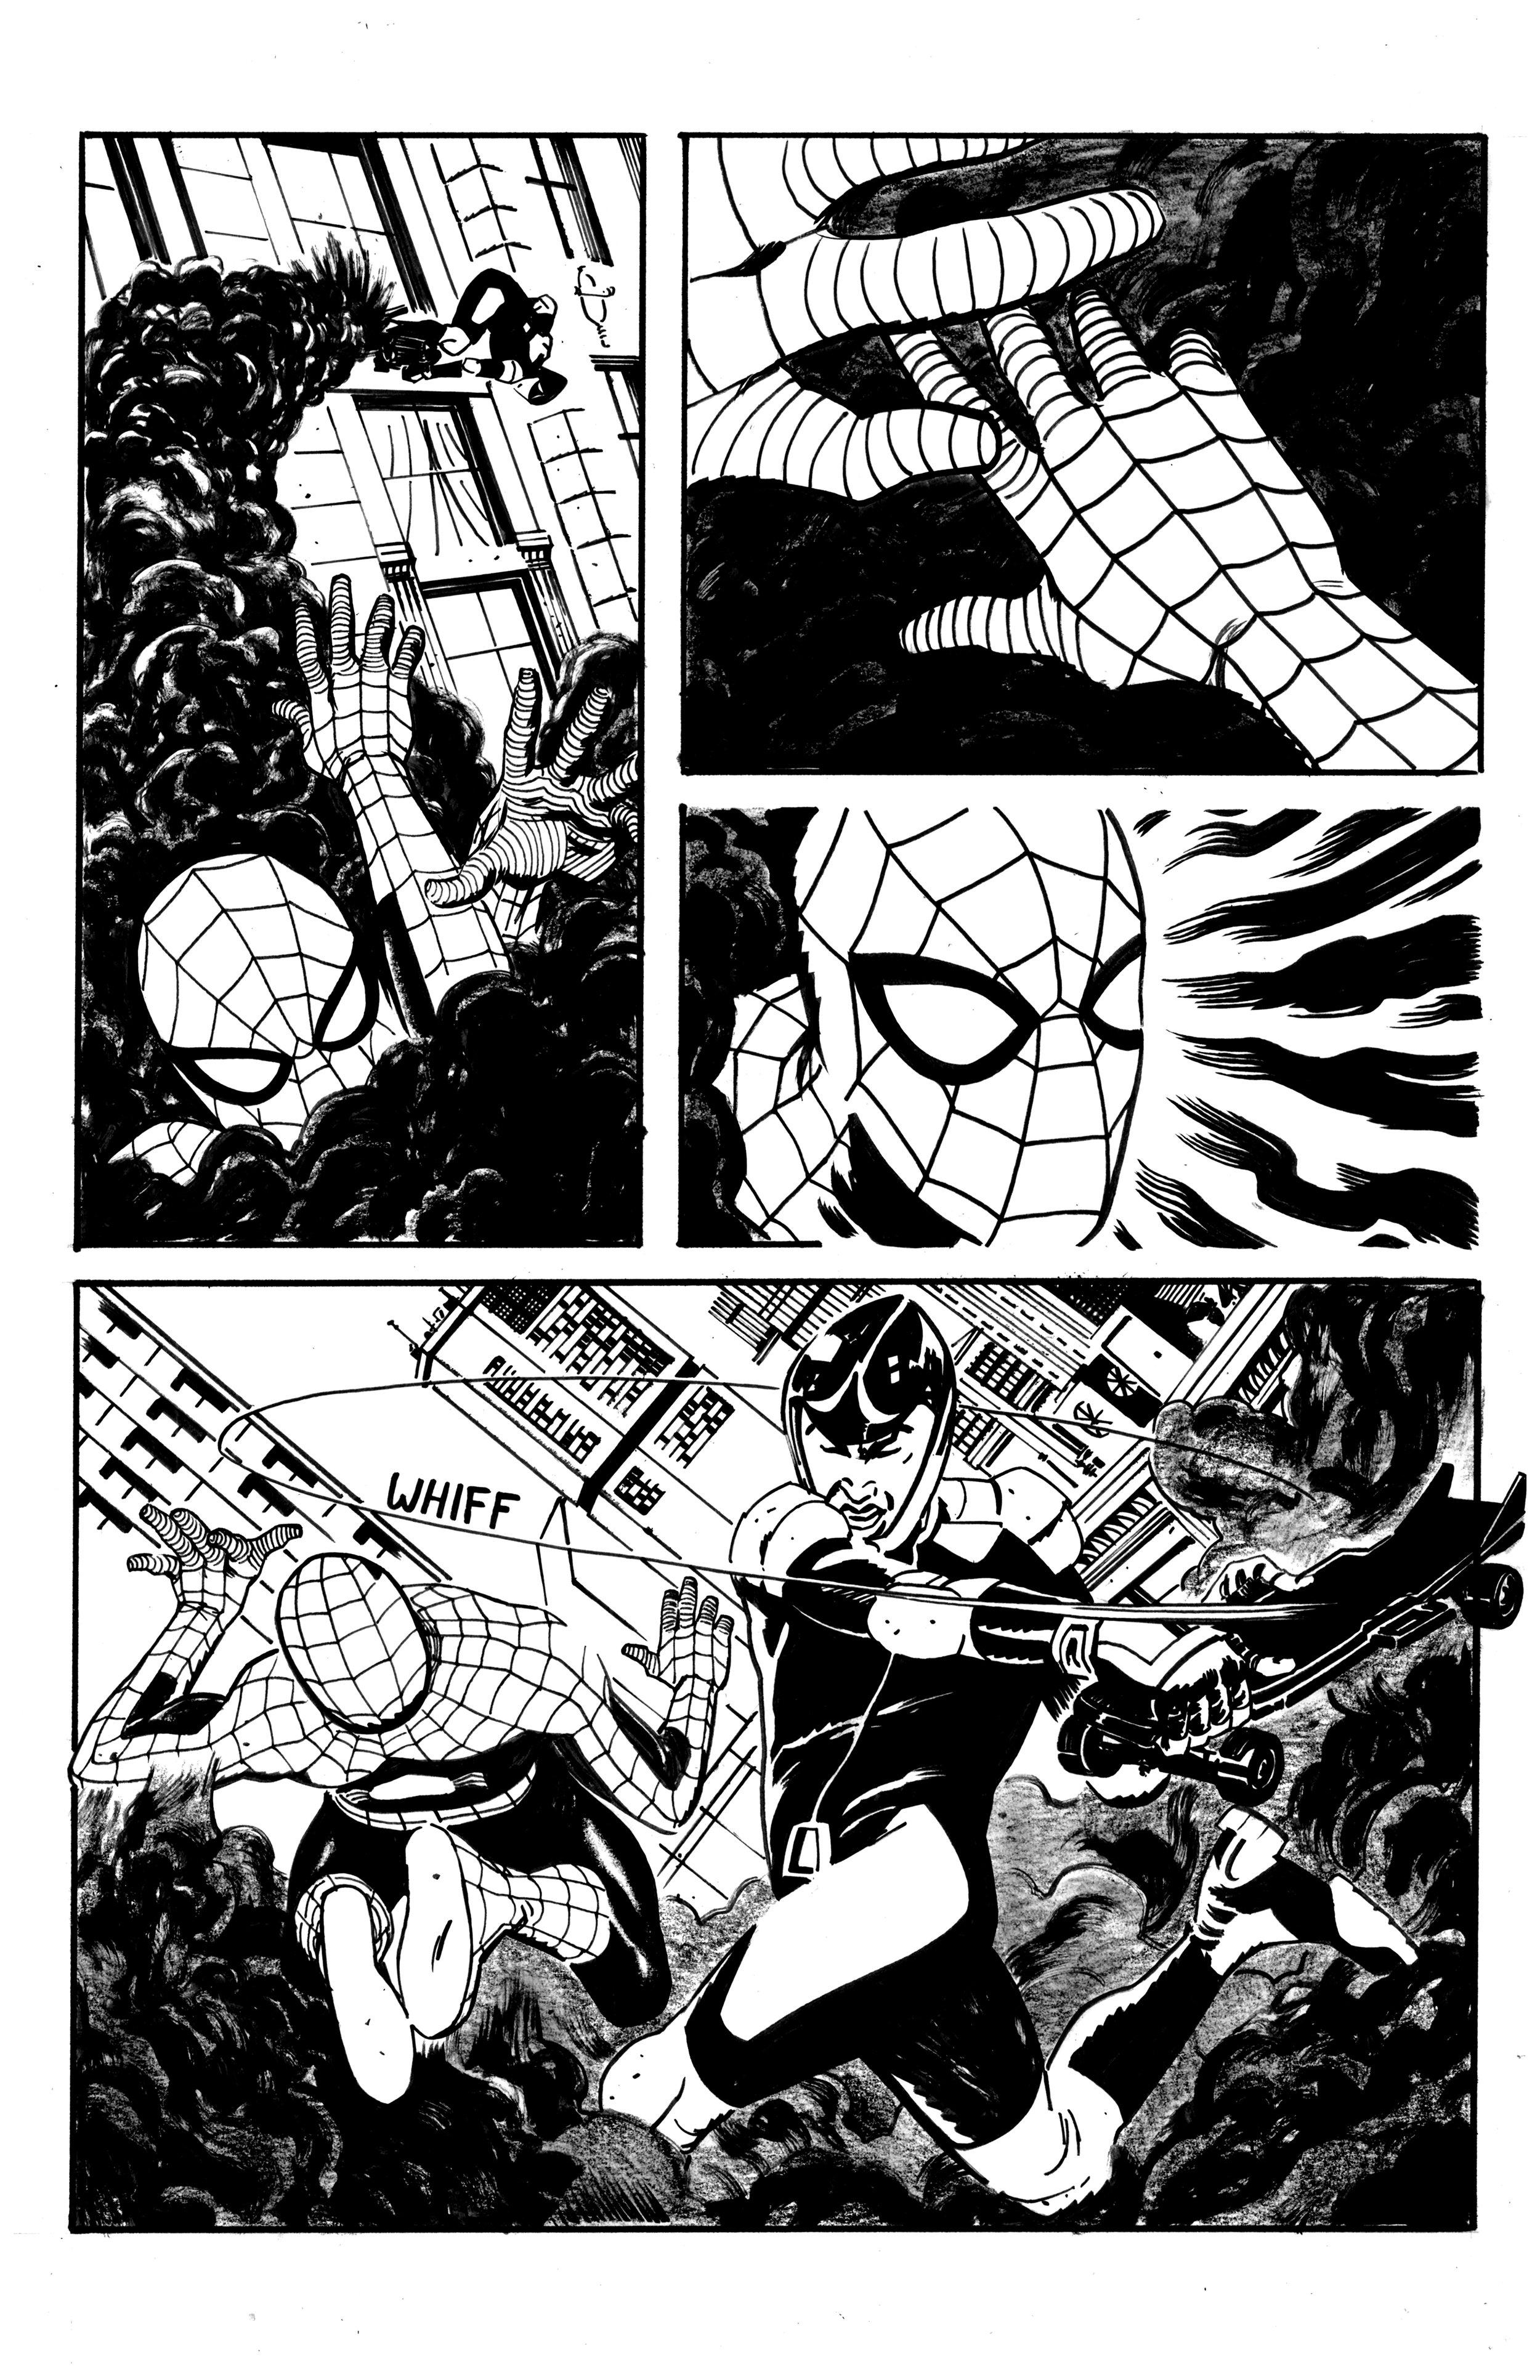 Spiderman-3-Web.jpg